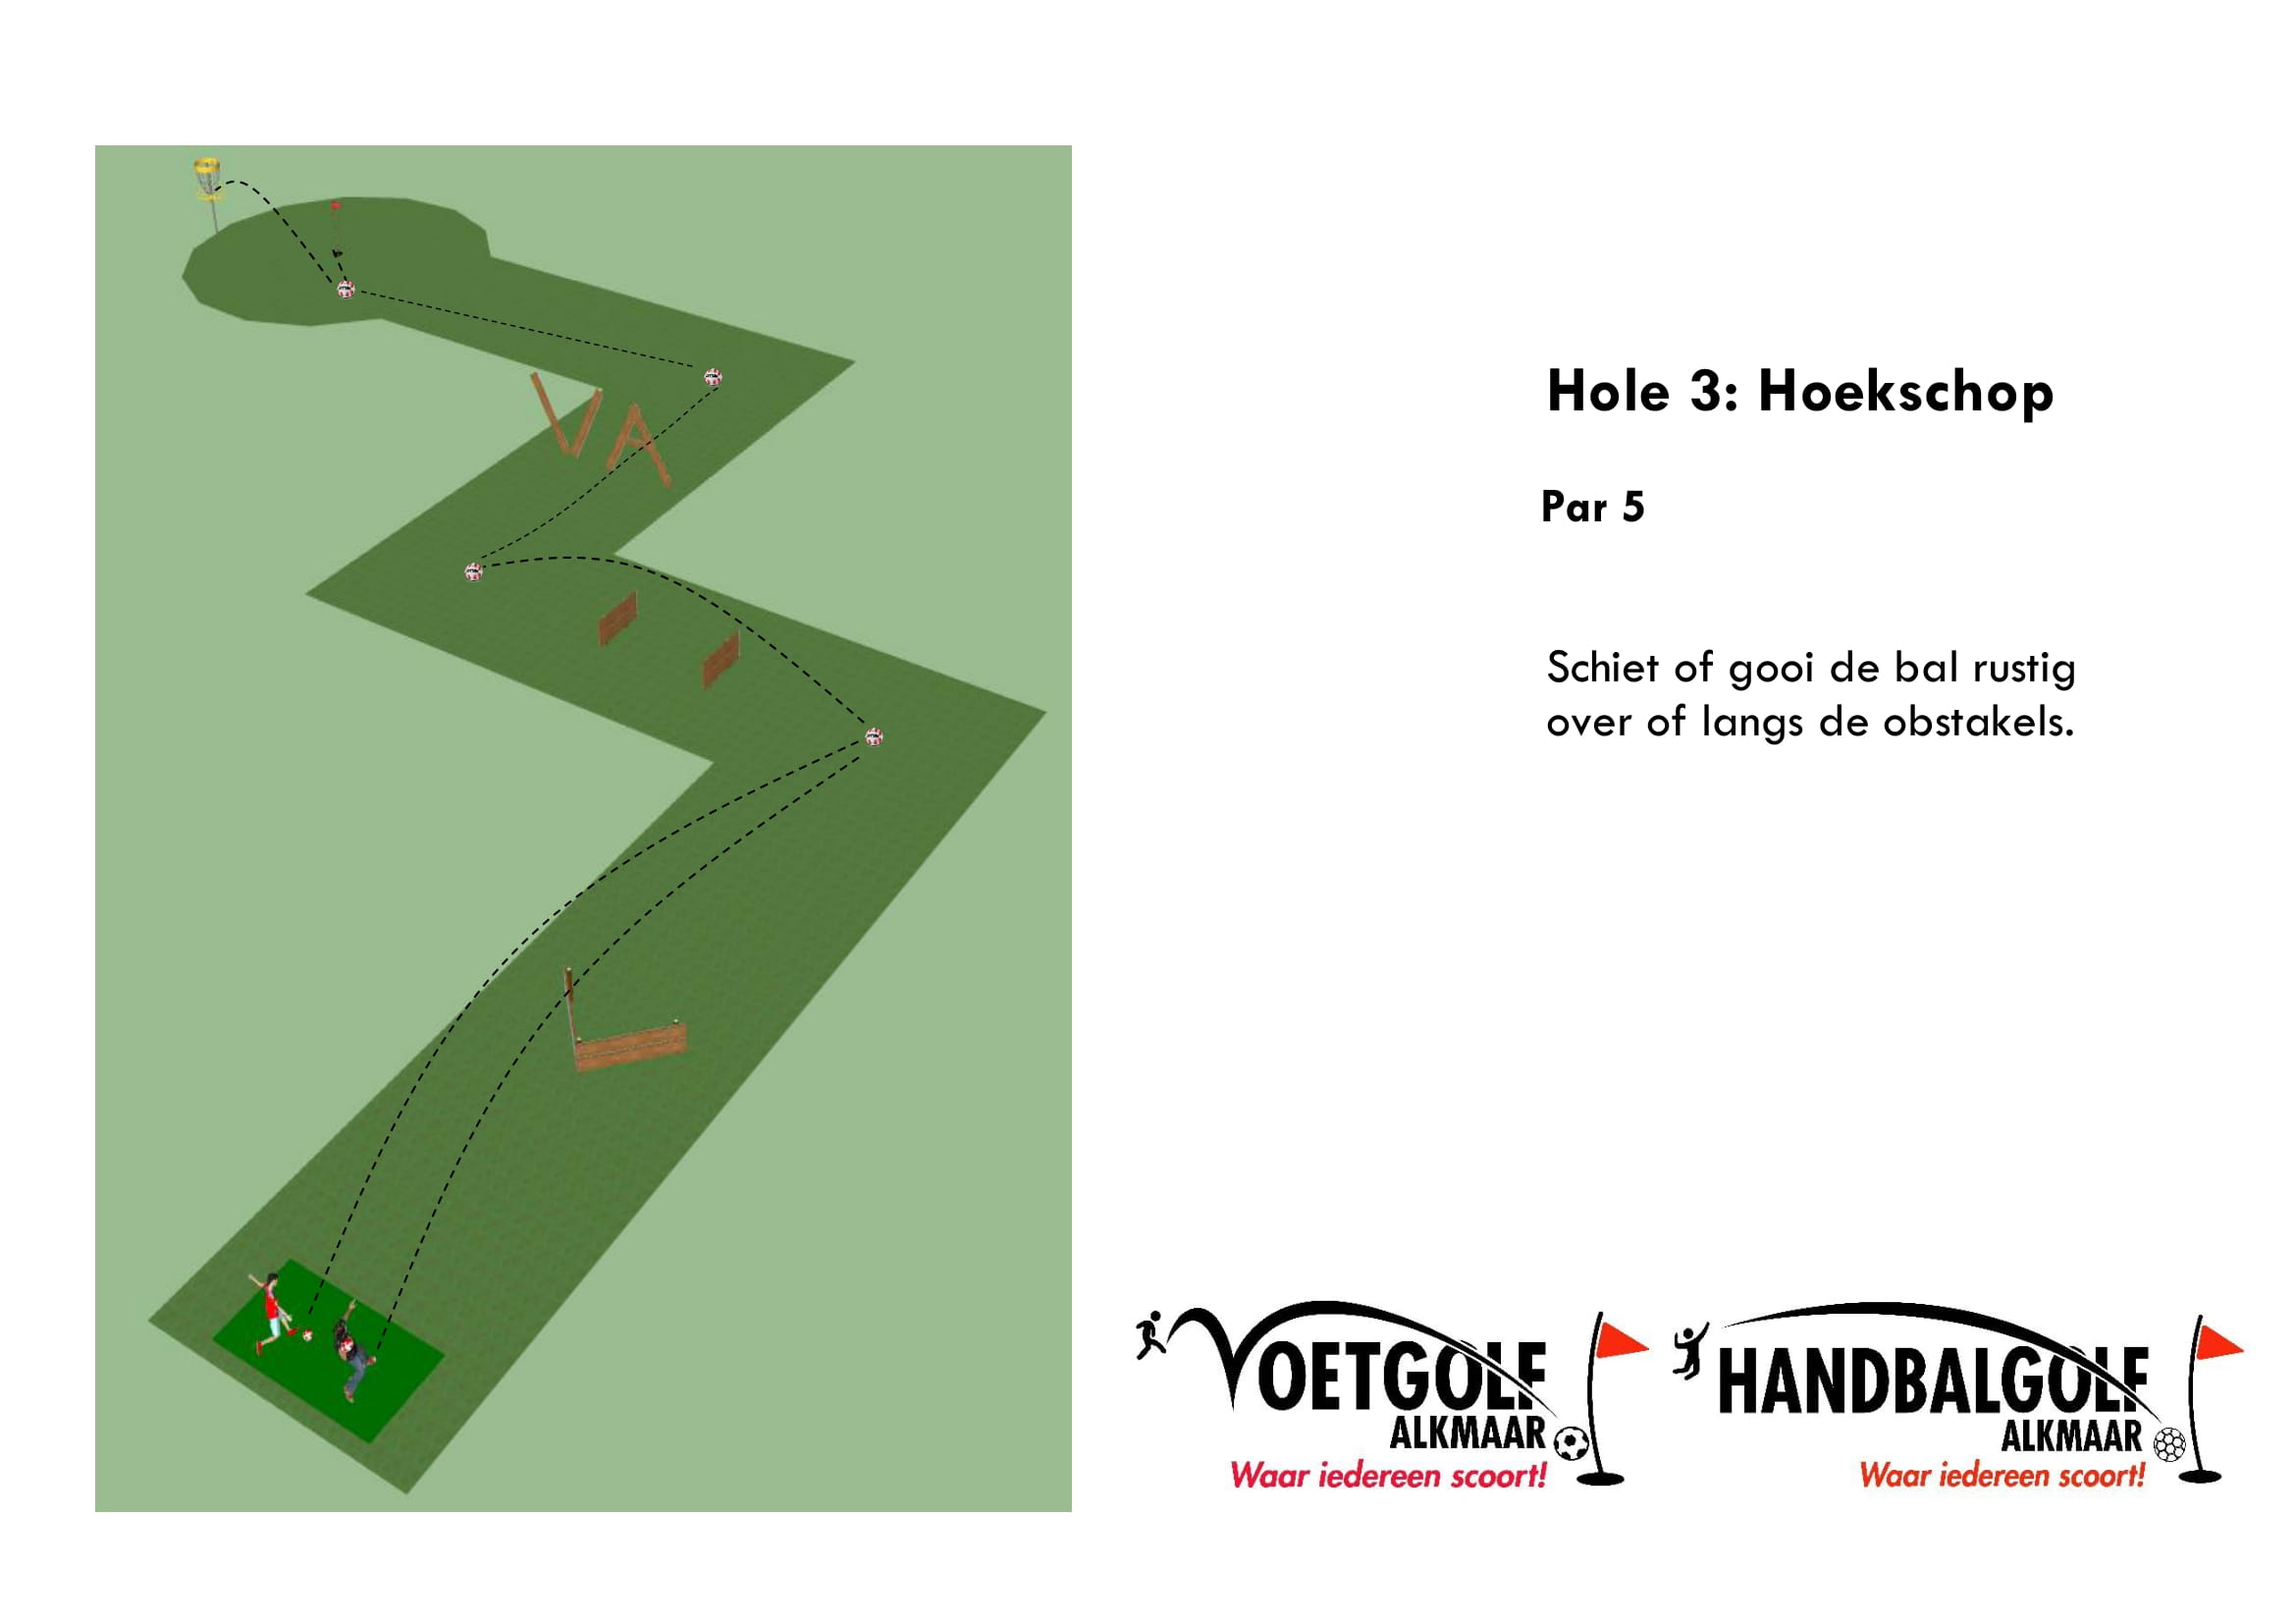 hole 3 met handbal